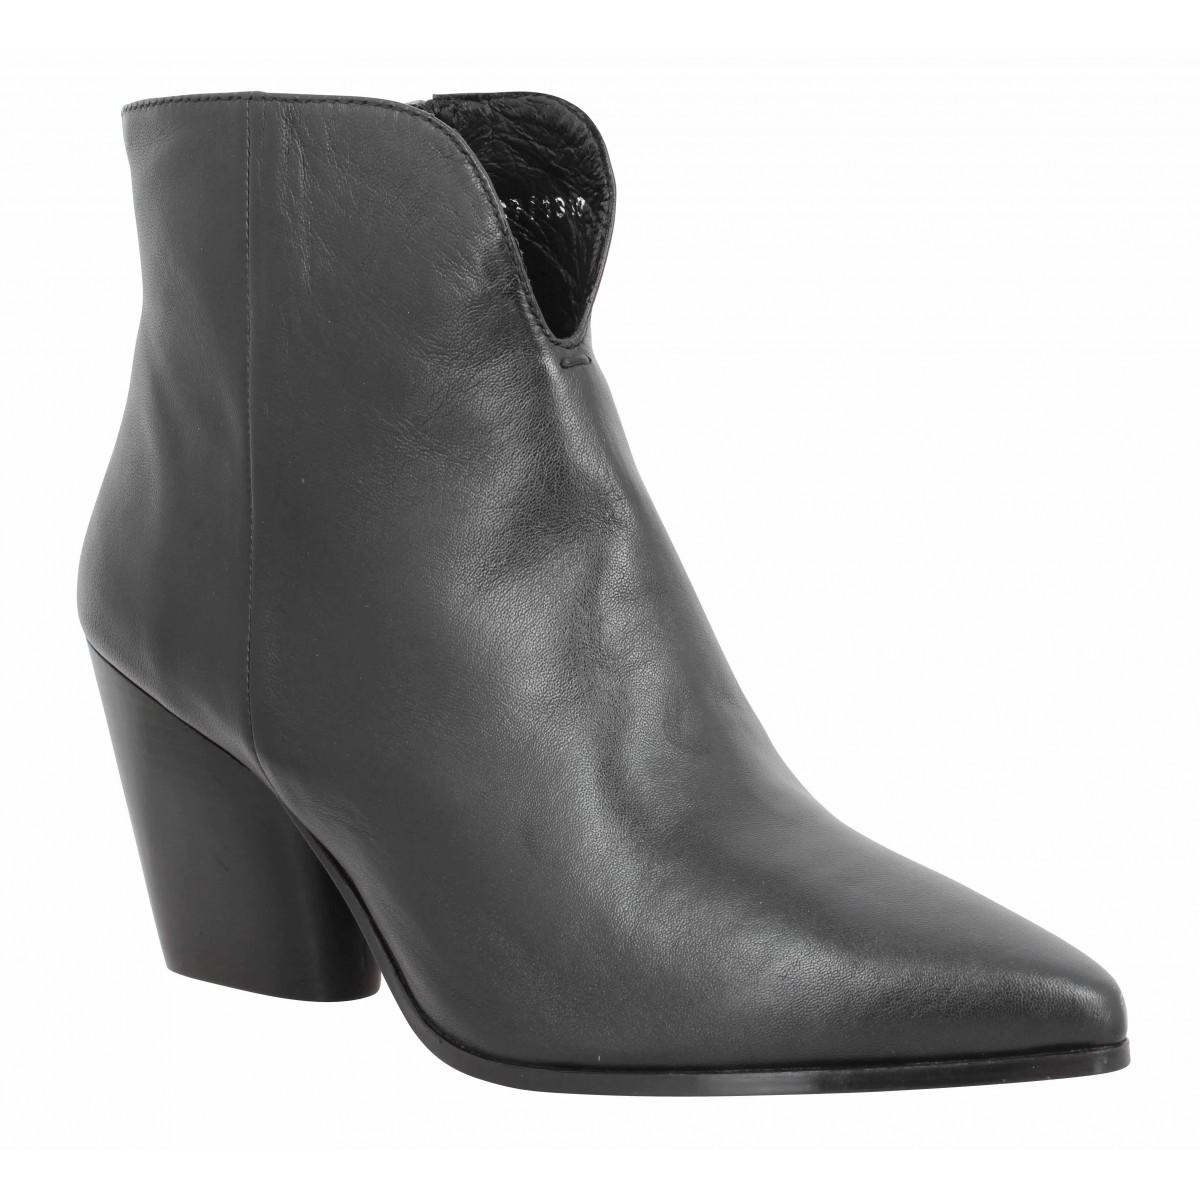 Bottines BRUNO PREMI 5620 cuir Femme Noir